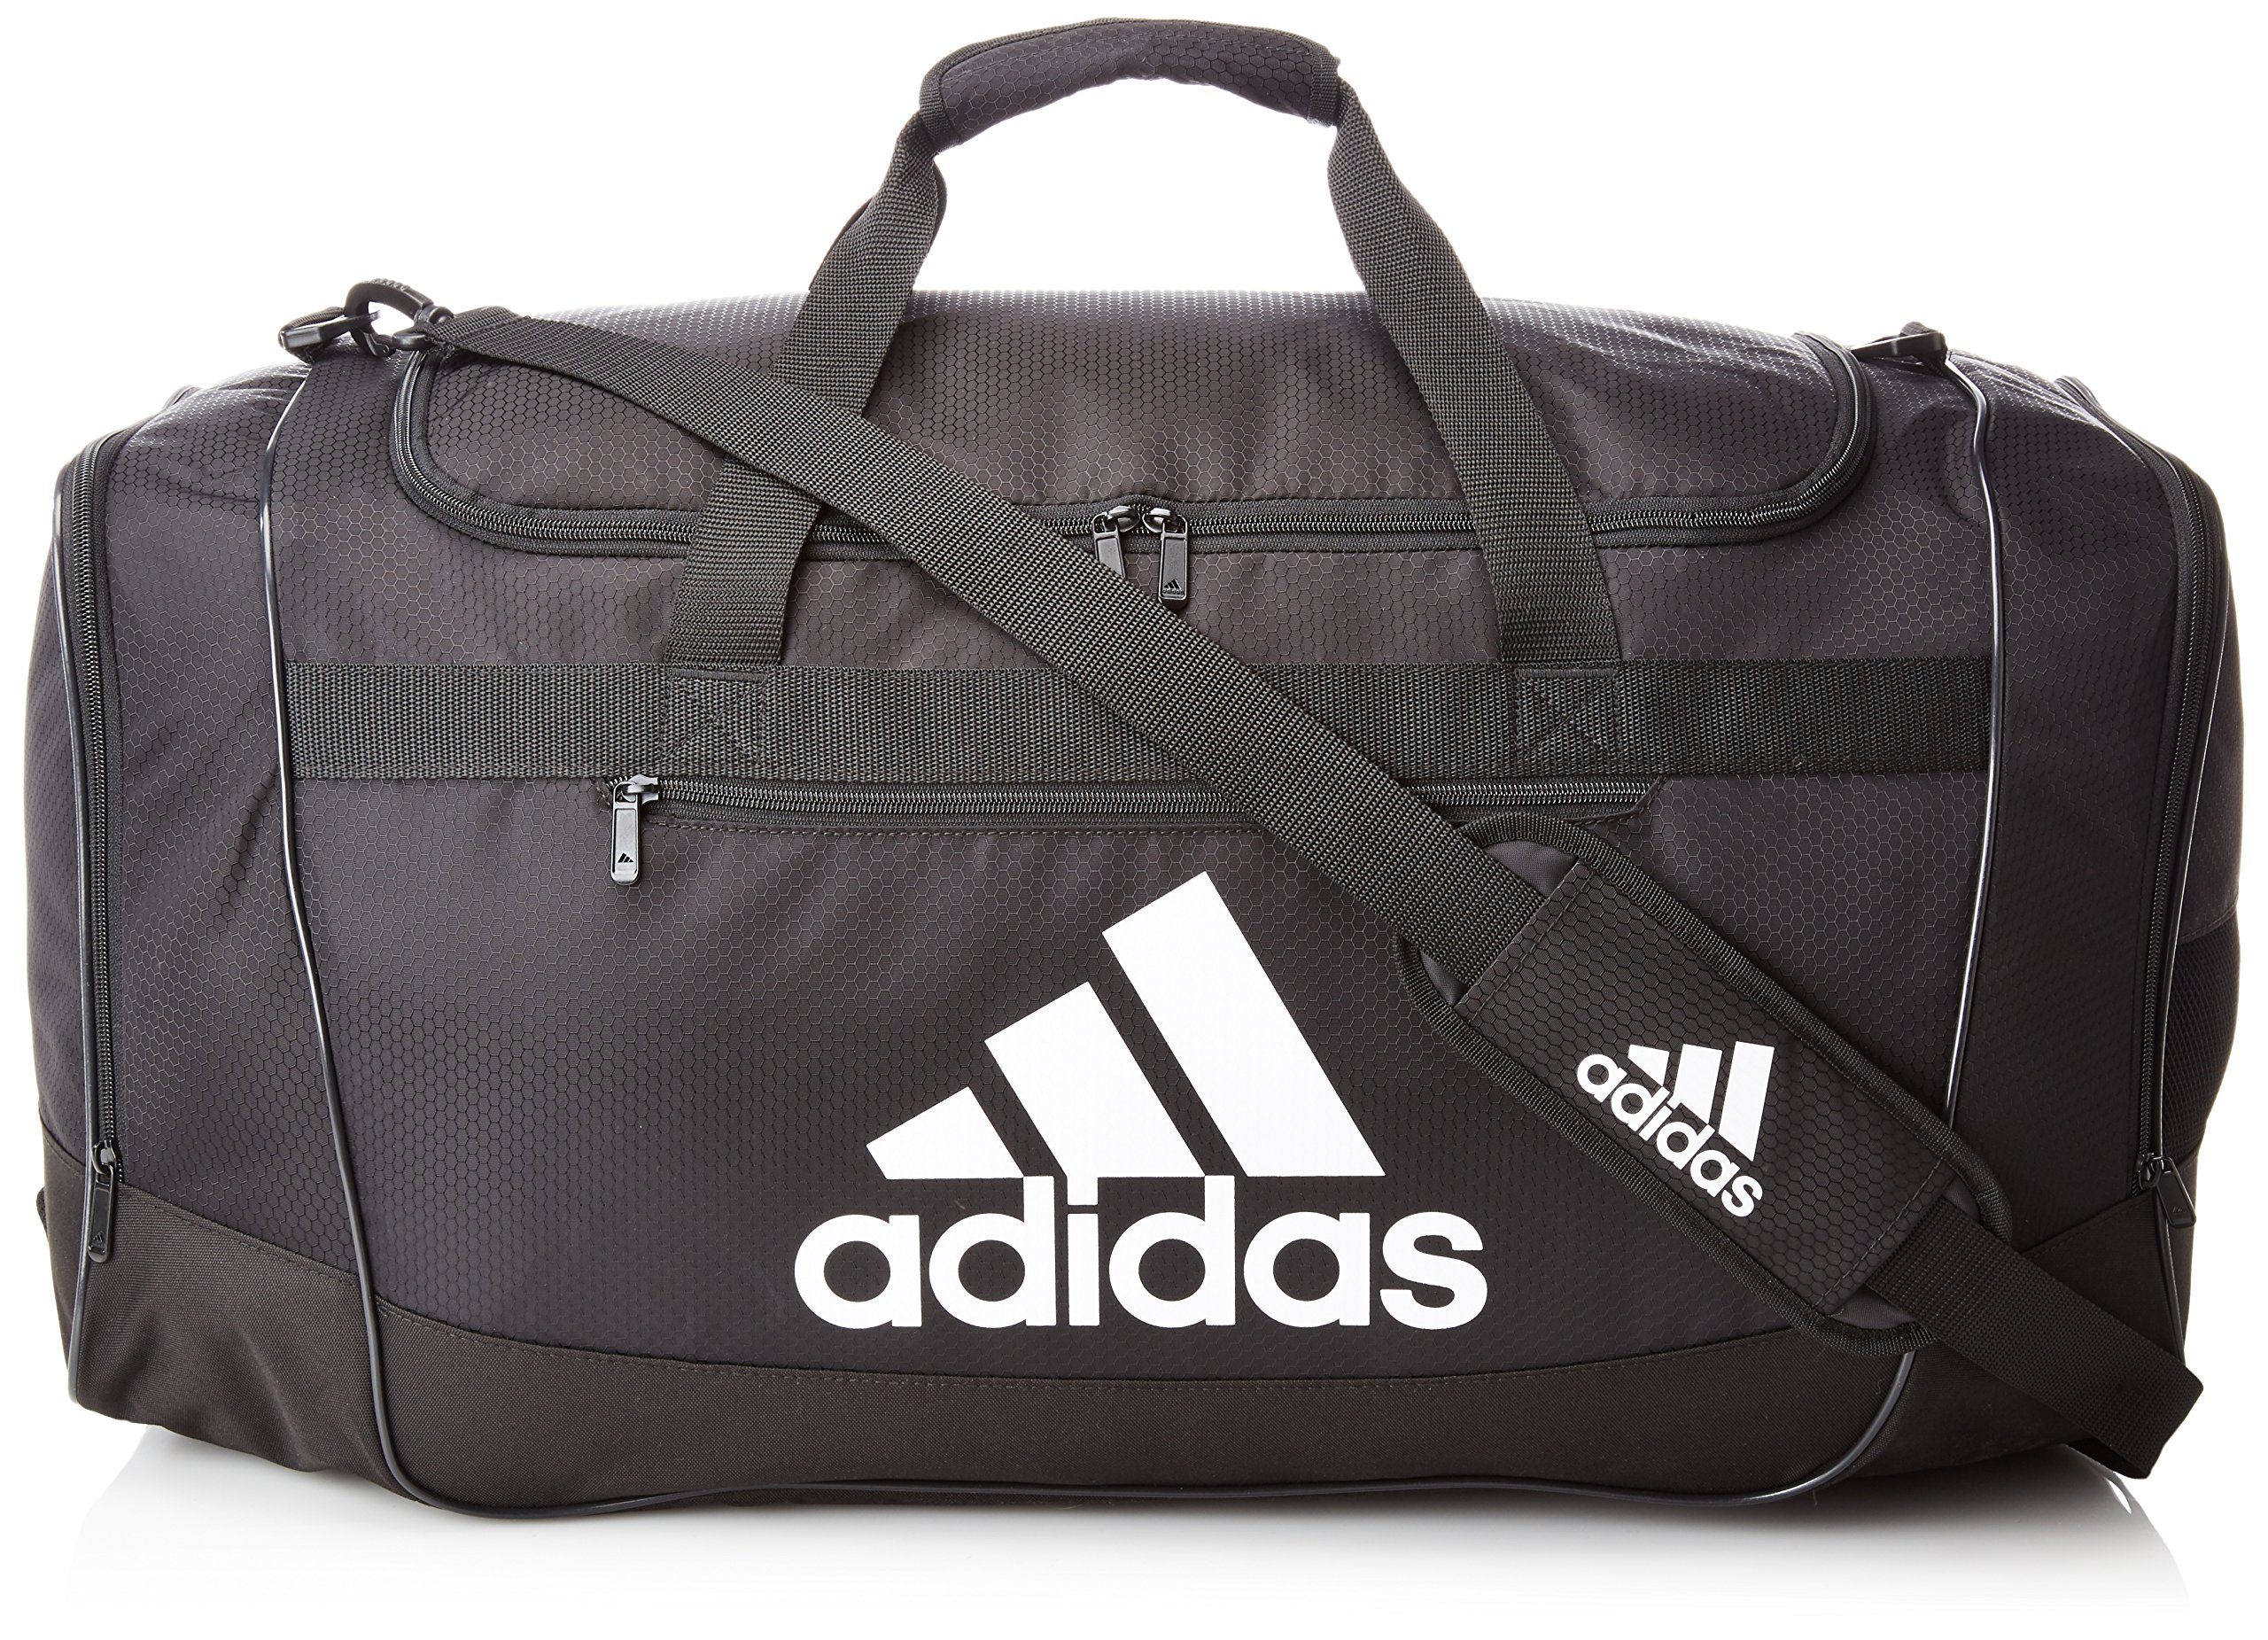 adidas Defender III medium duffel Bag, Onix Jersey/Black, One Size ...